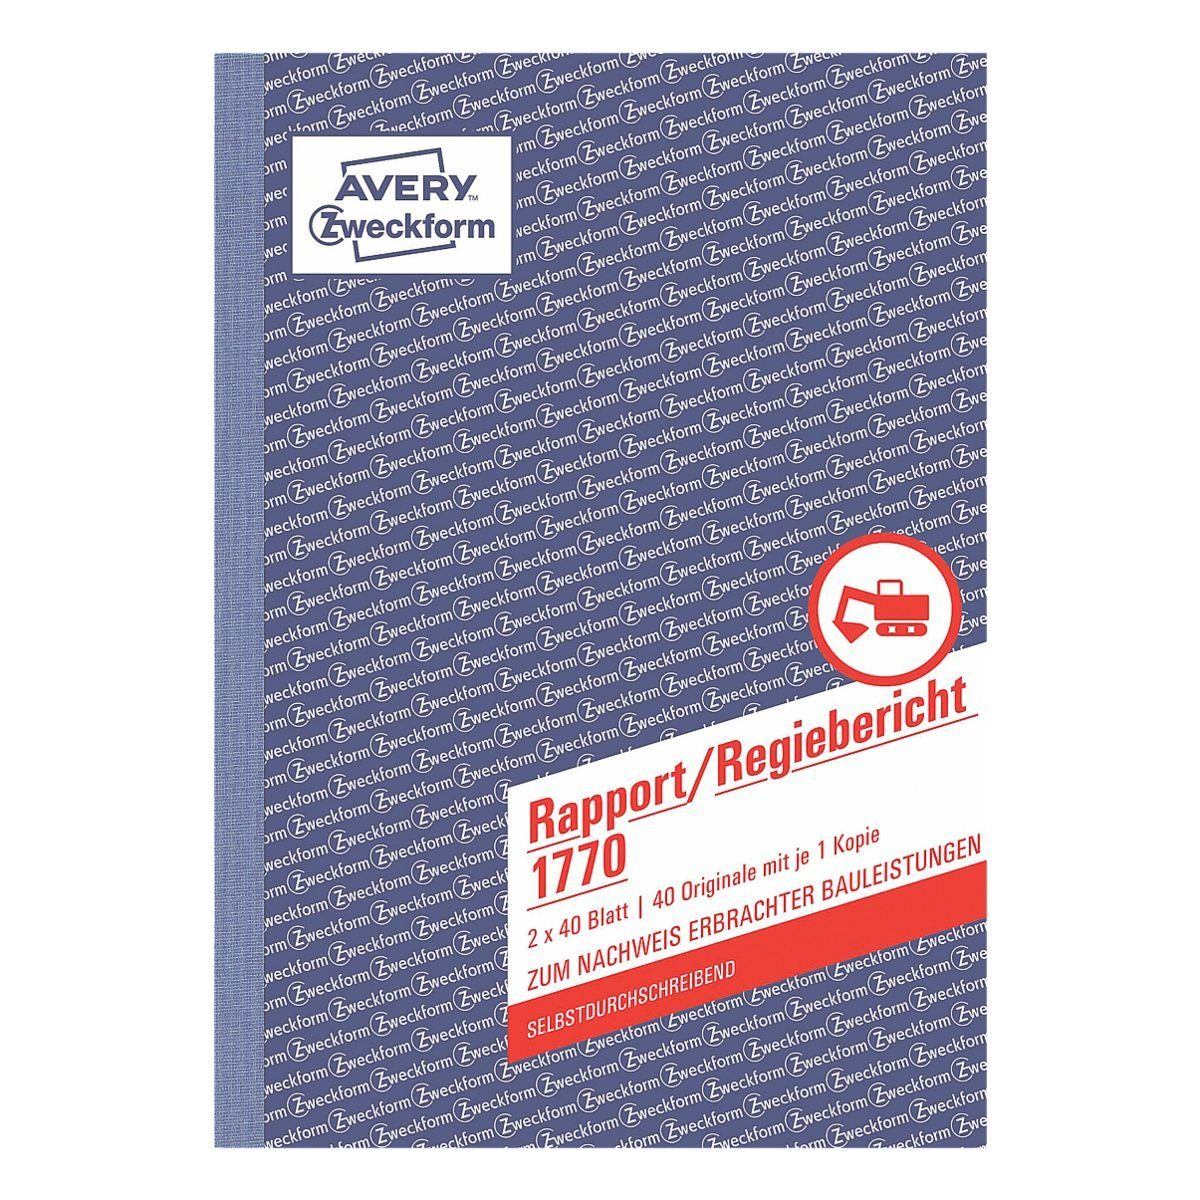 Avery Zweckform 1770 Rapport//Regiebericht 20